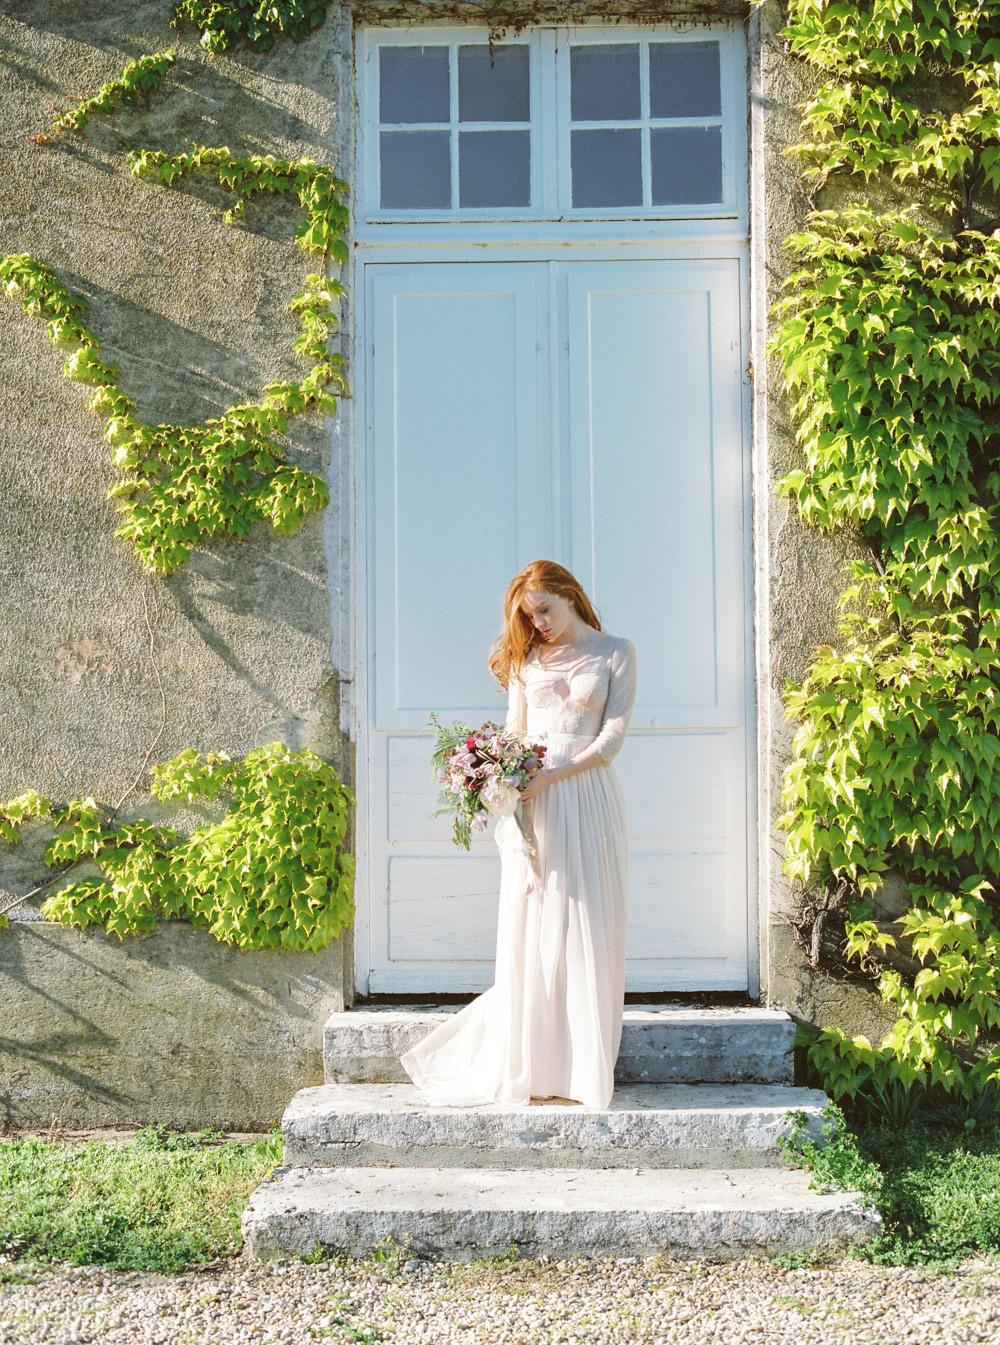 blanccoco_photographe_mariage_chic_nude_pastel_chateau_montplaisant_46jpg